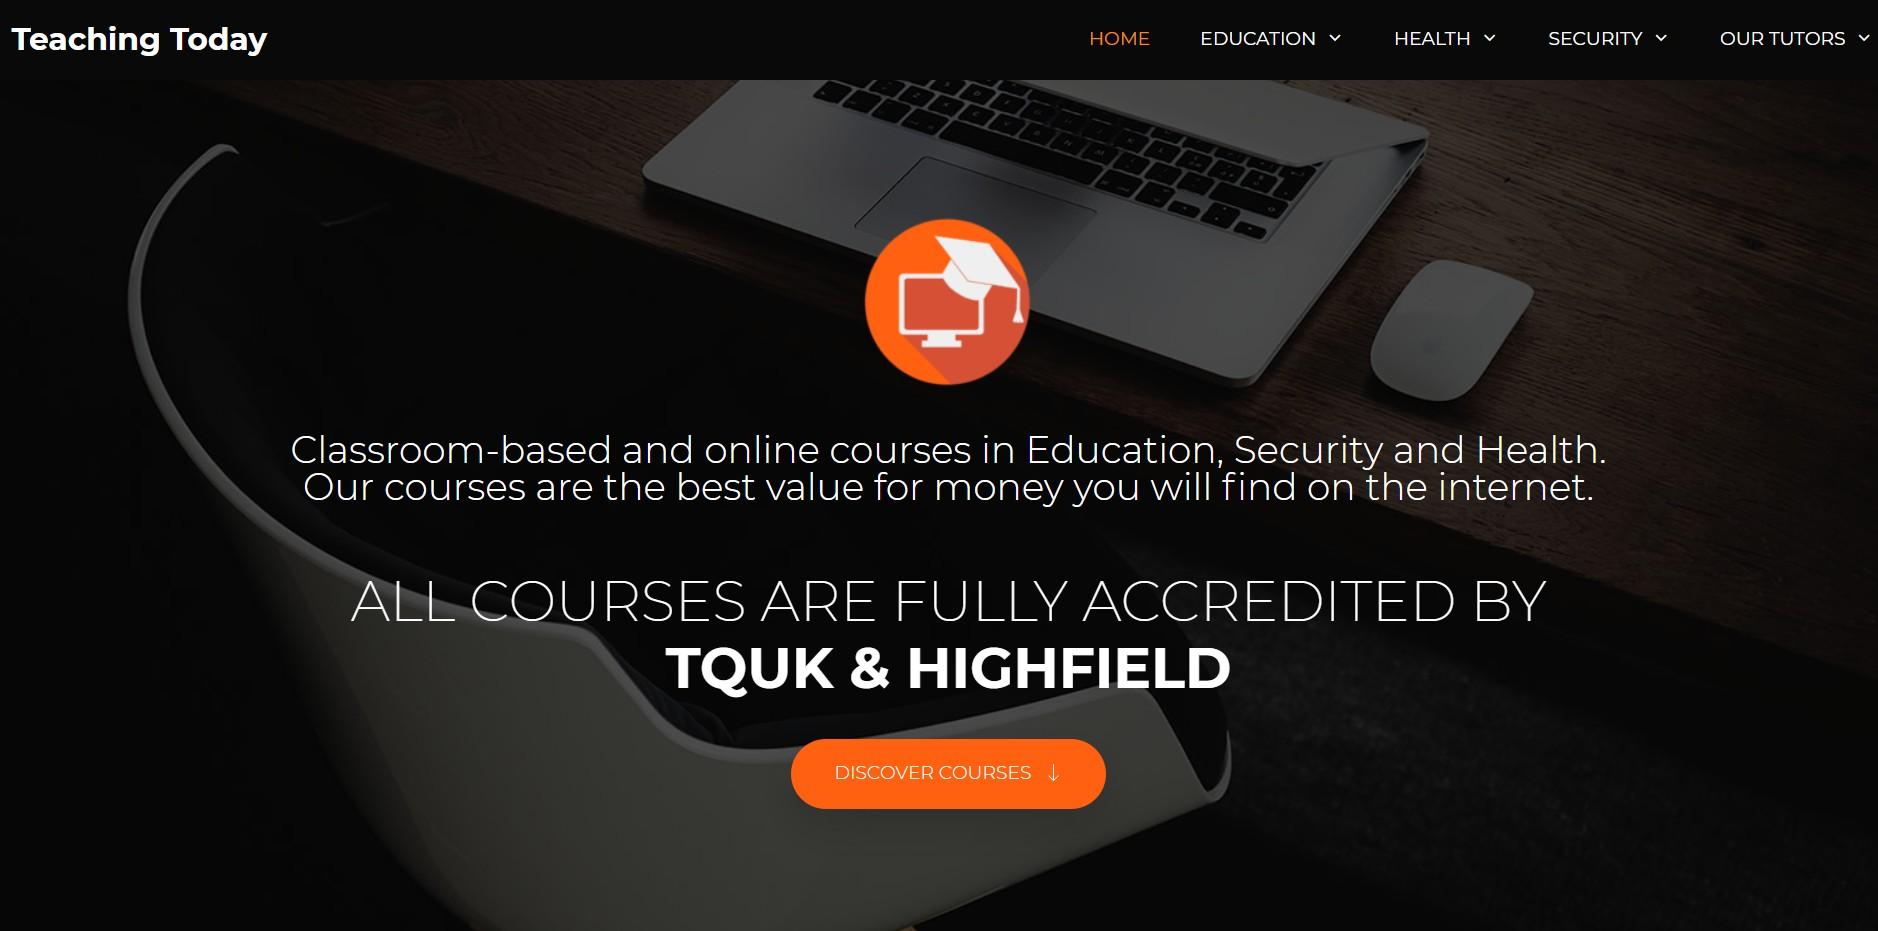 teaching today homepage